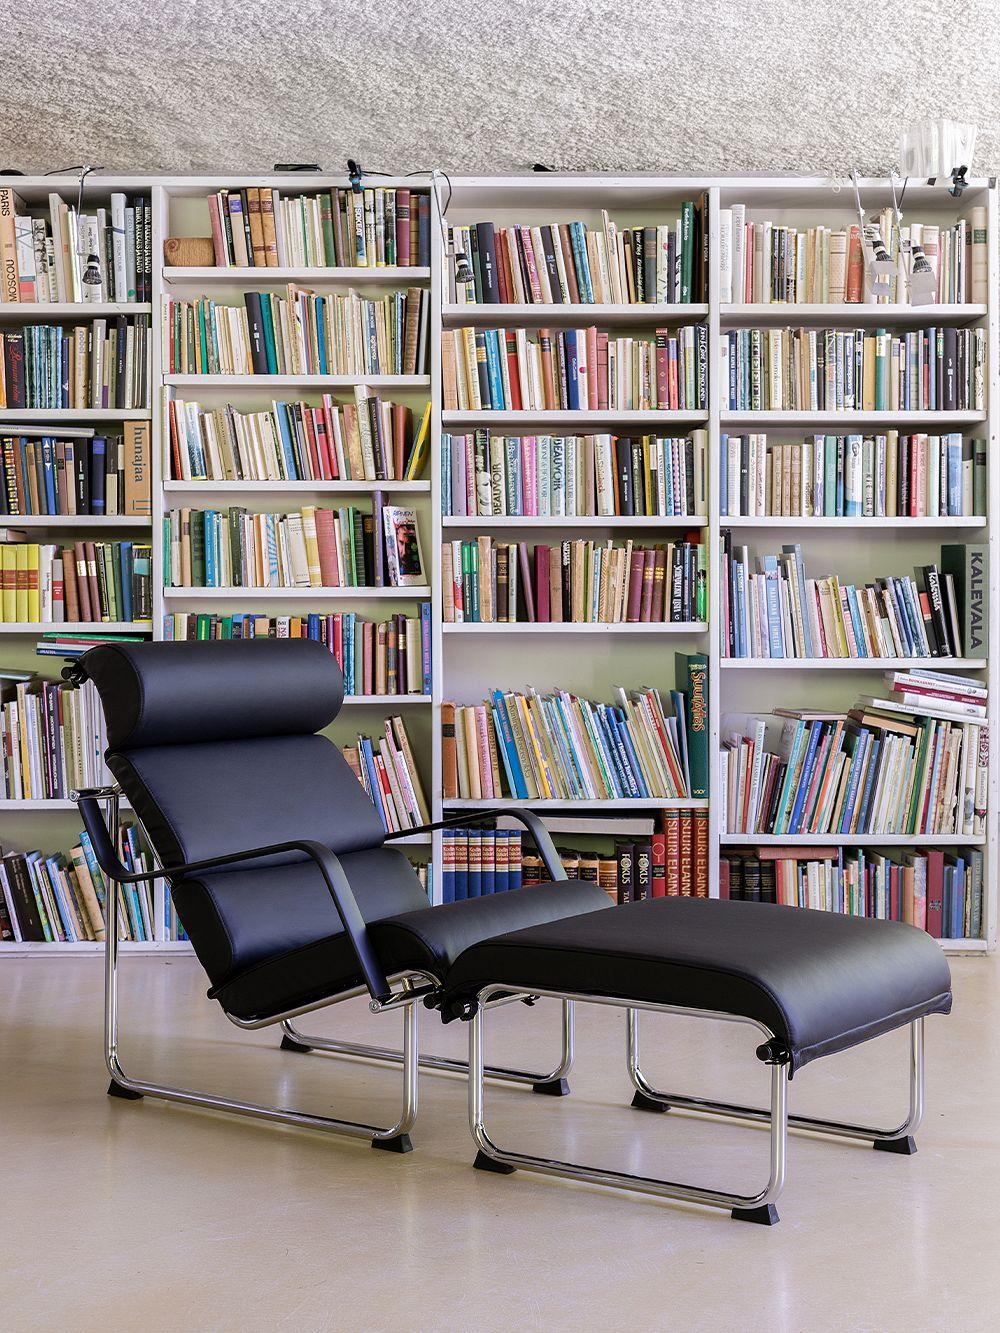 Remmi chair by Yrjö Kukkapuro